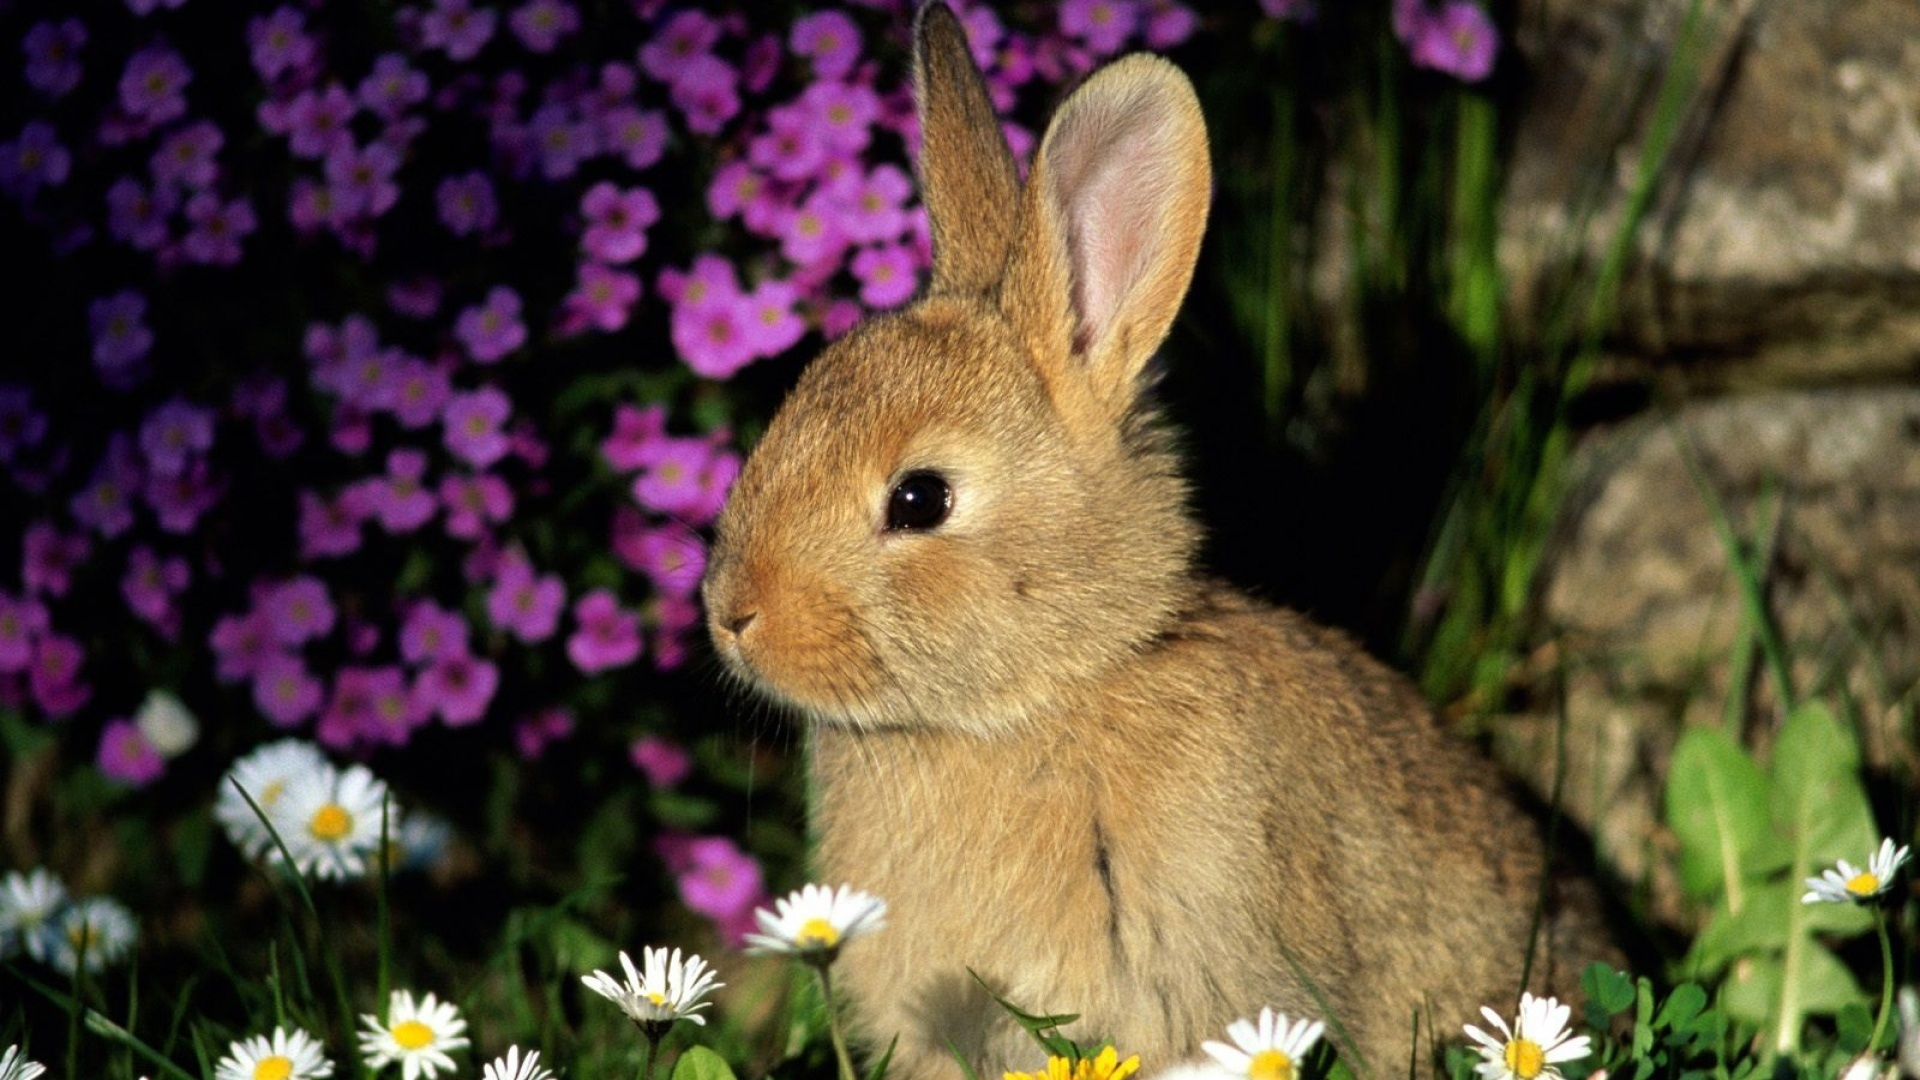 Cute Rabbit desktop wallpaper hd